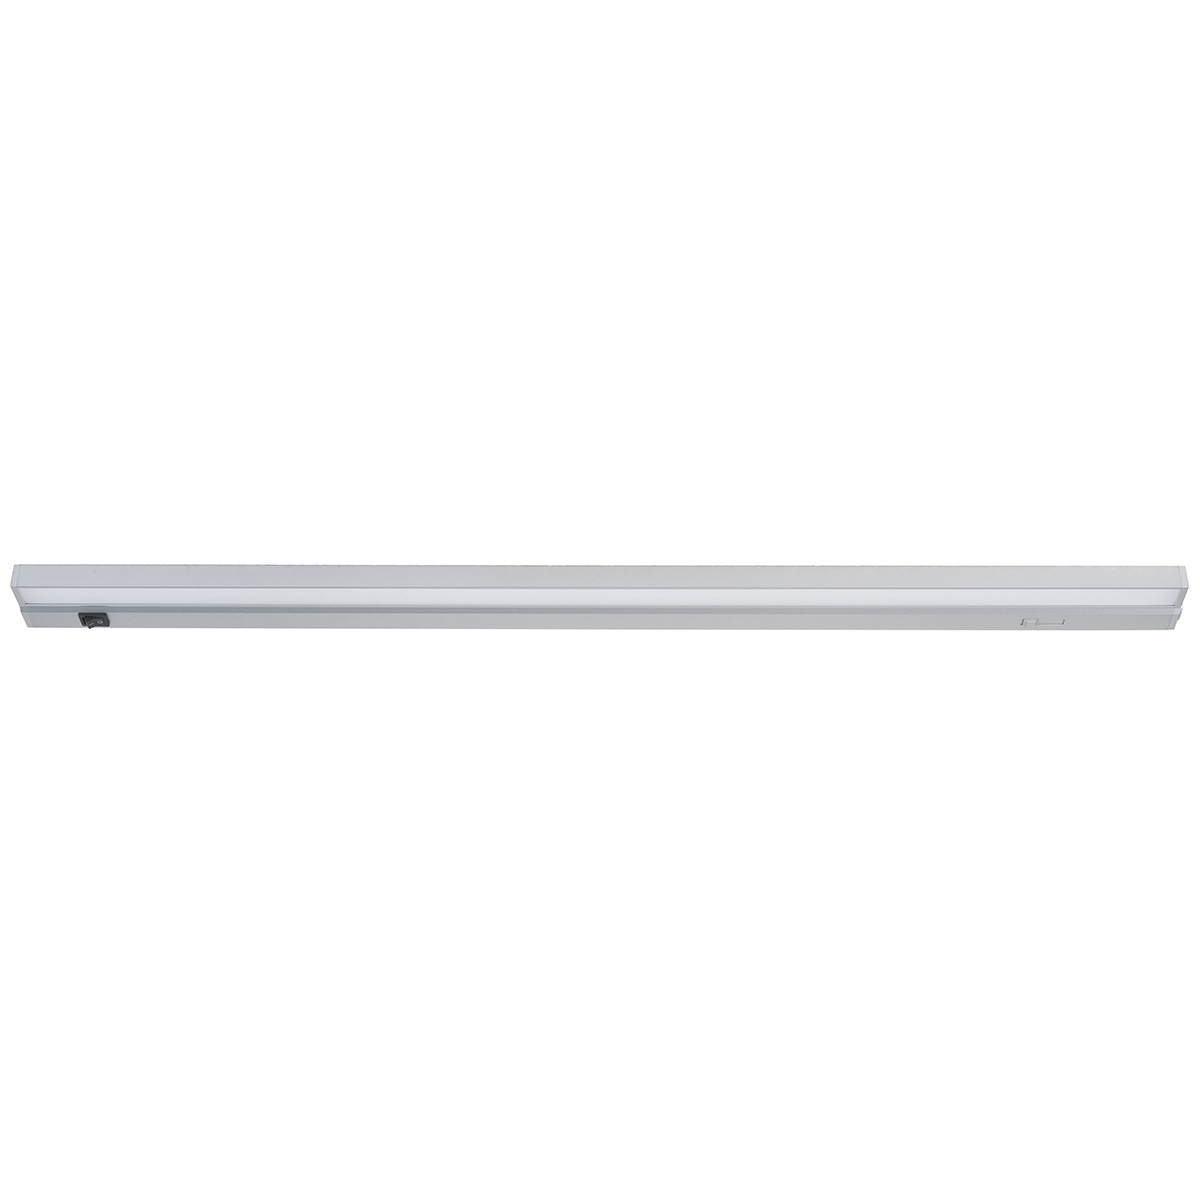 Highlight Kast verlichting LED 88 cm aluminium